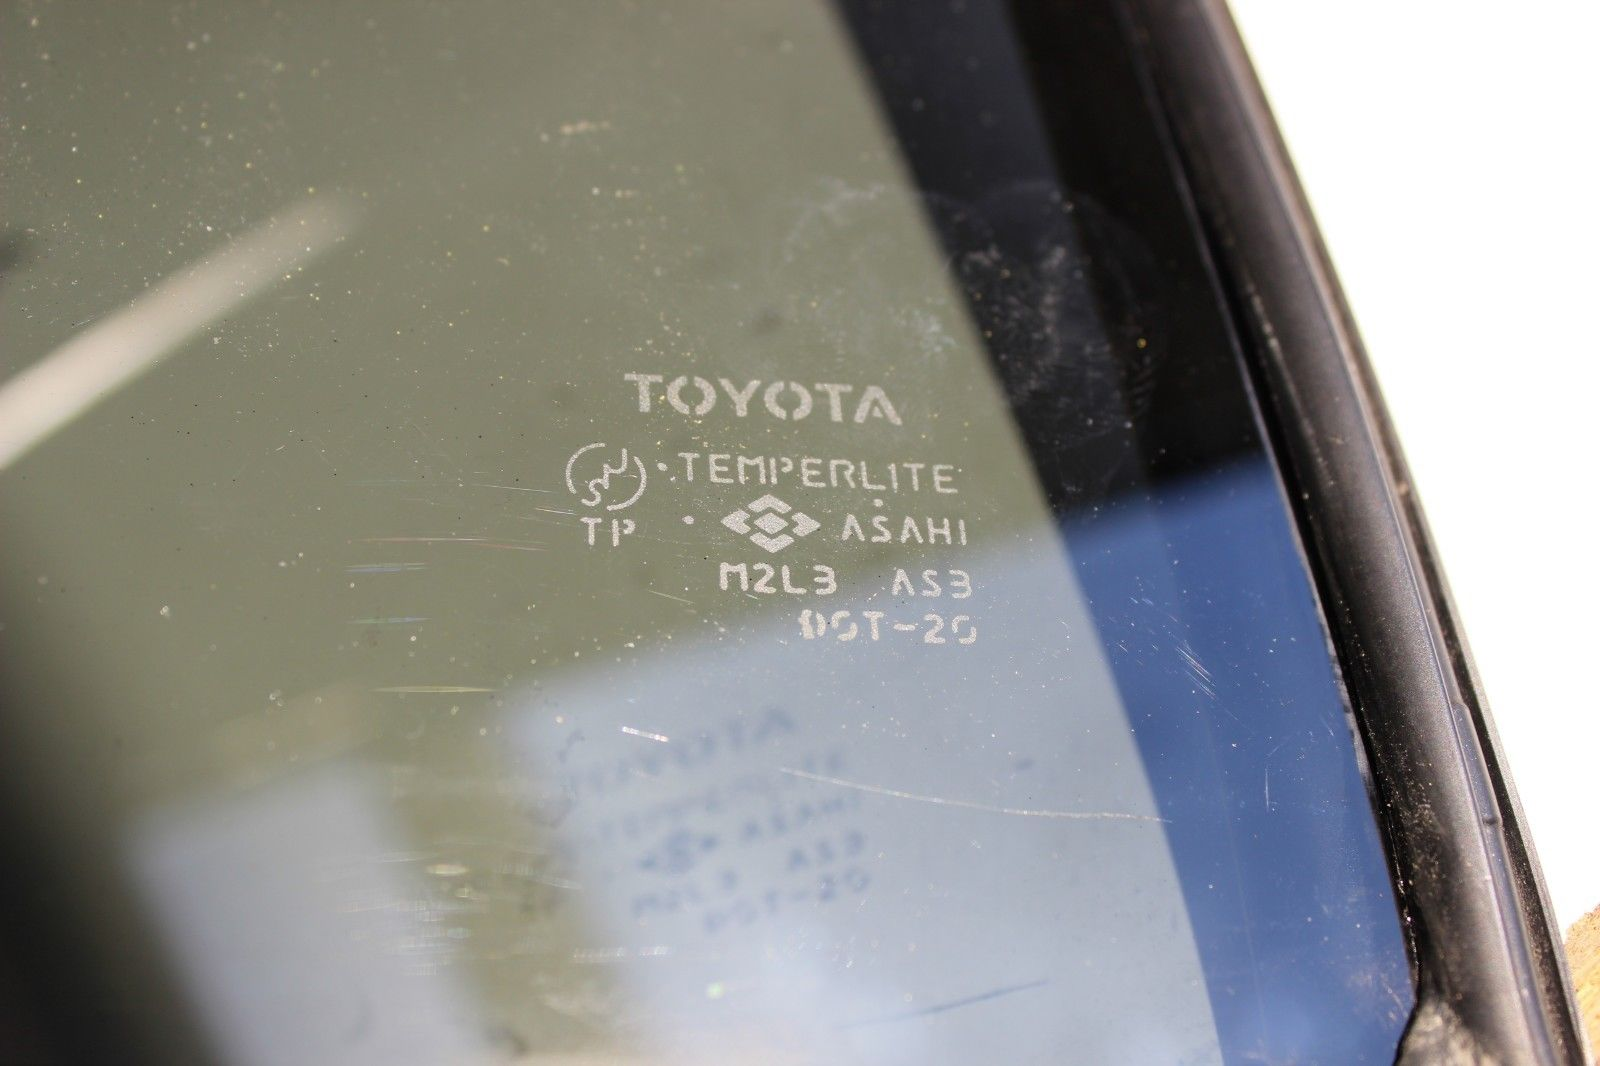 Toyota Highlander Service Manual: Rear axle LH hub bolt